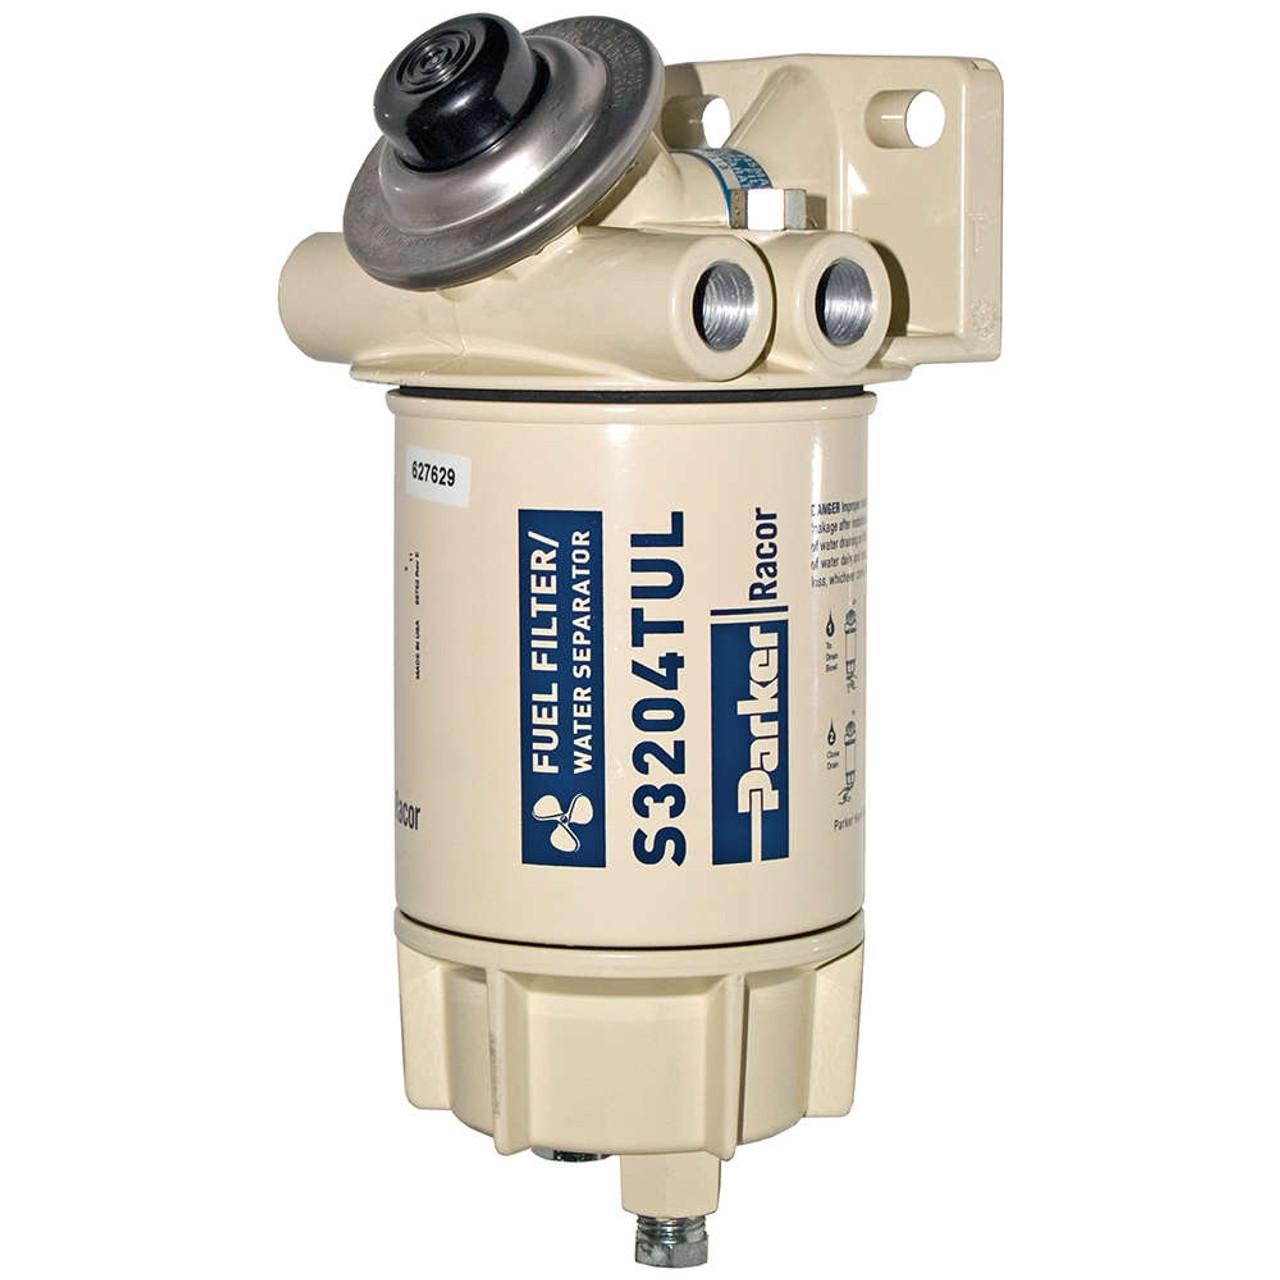 medium resolution of racor aquabloc marine 3 8 in 45 gph spin on diesel fuel filter water separator assembly 6 qty john m ellsworth co inc